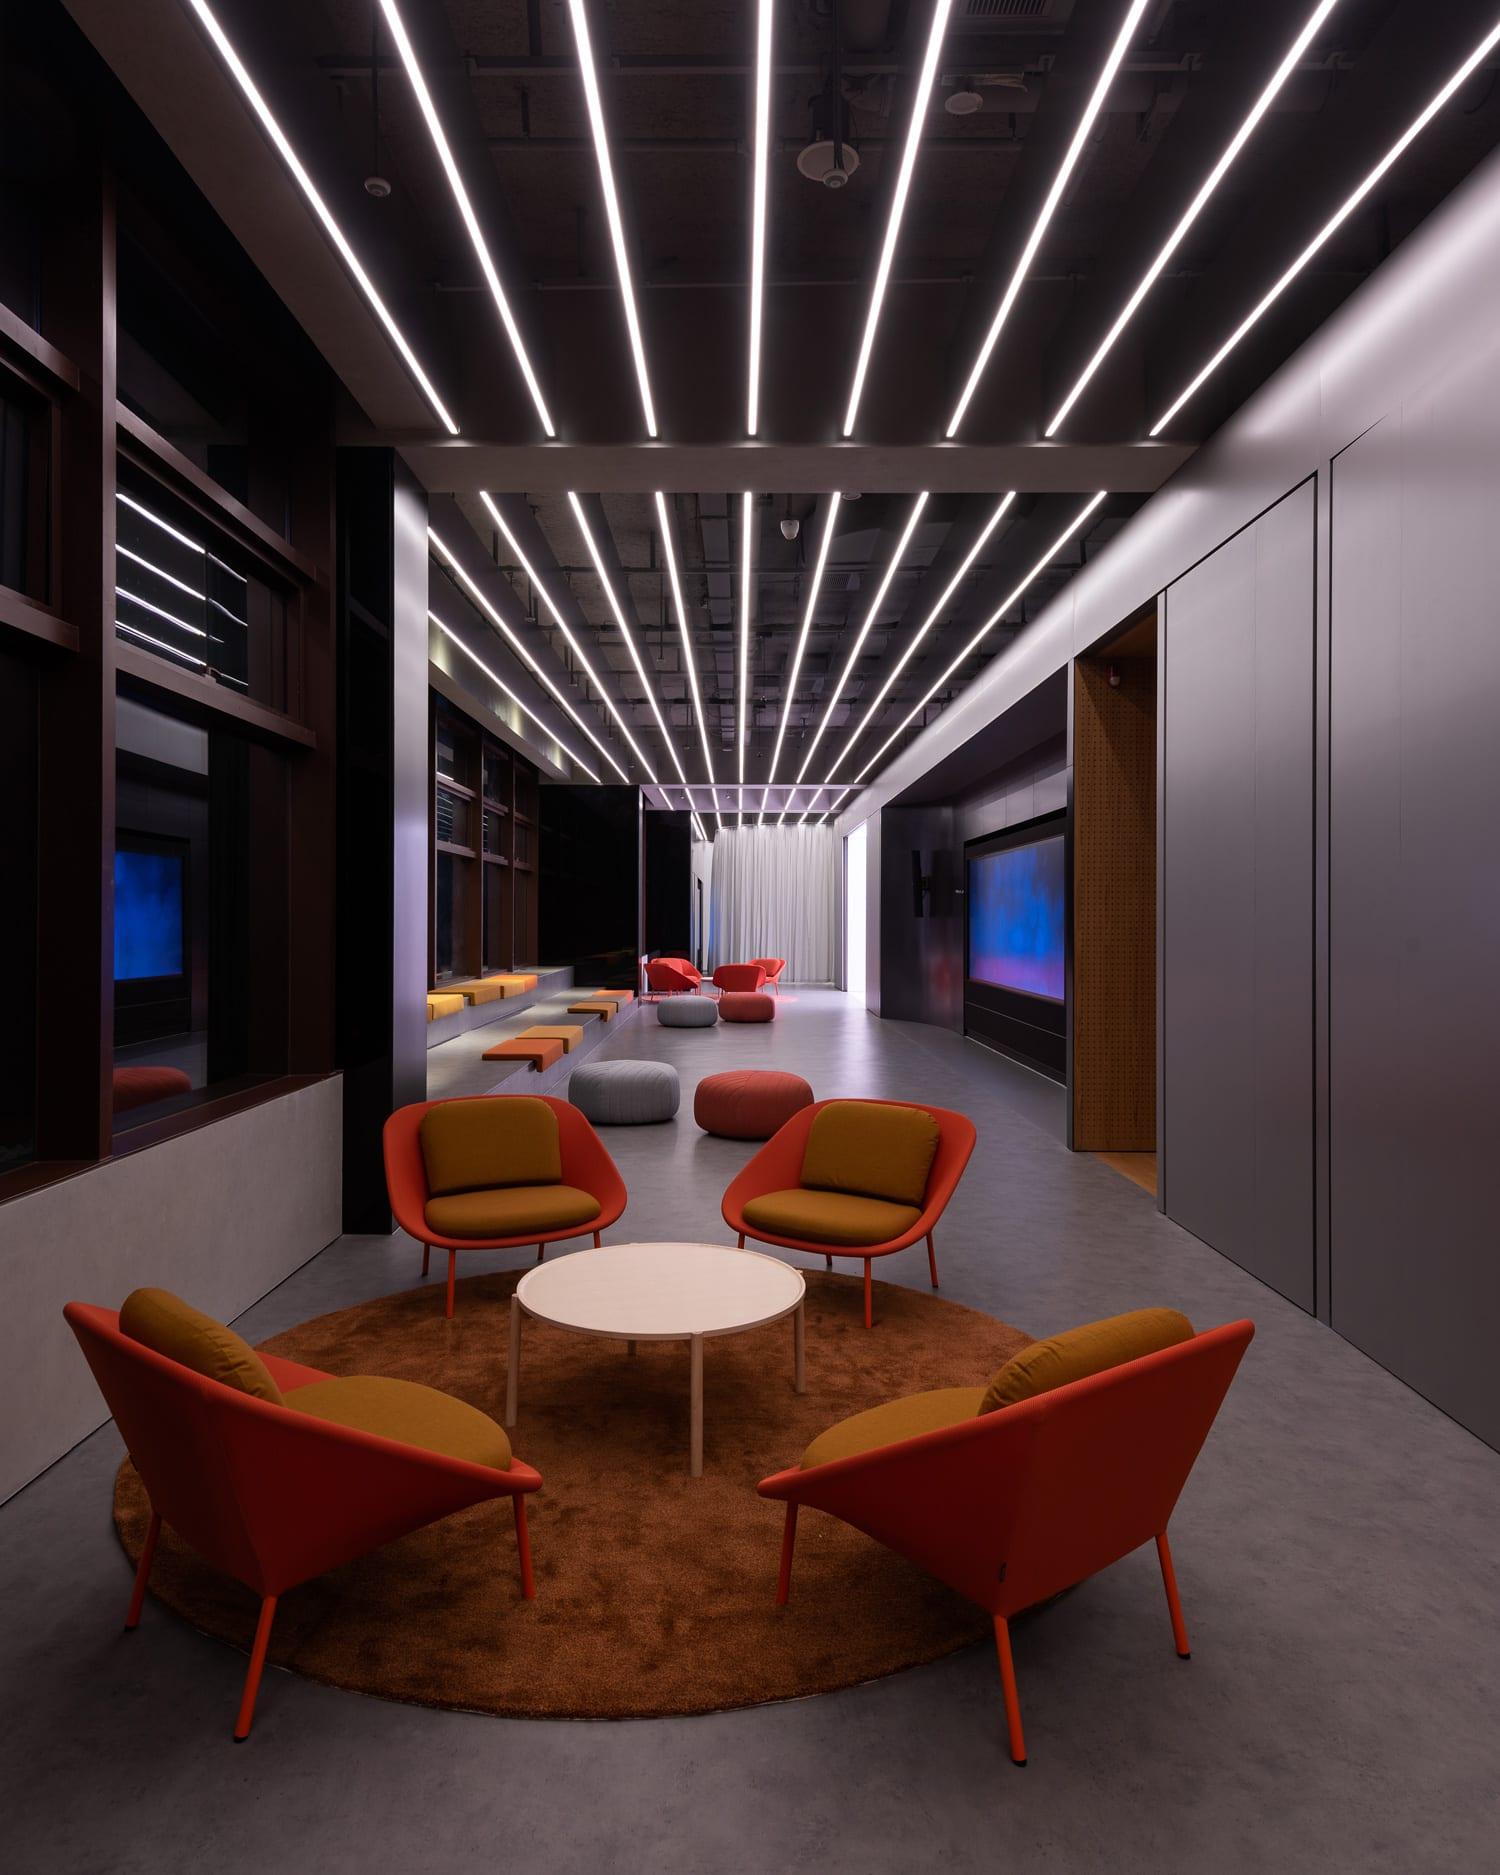 architecture aw raics innovation - HD1460×1825